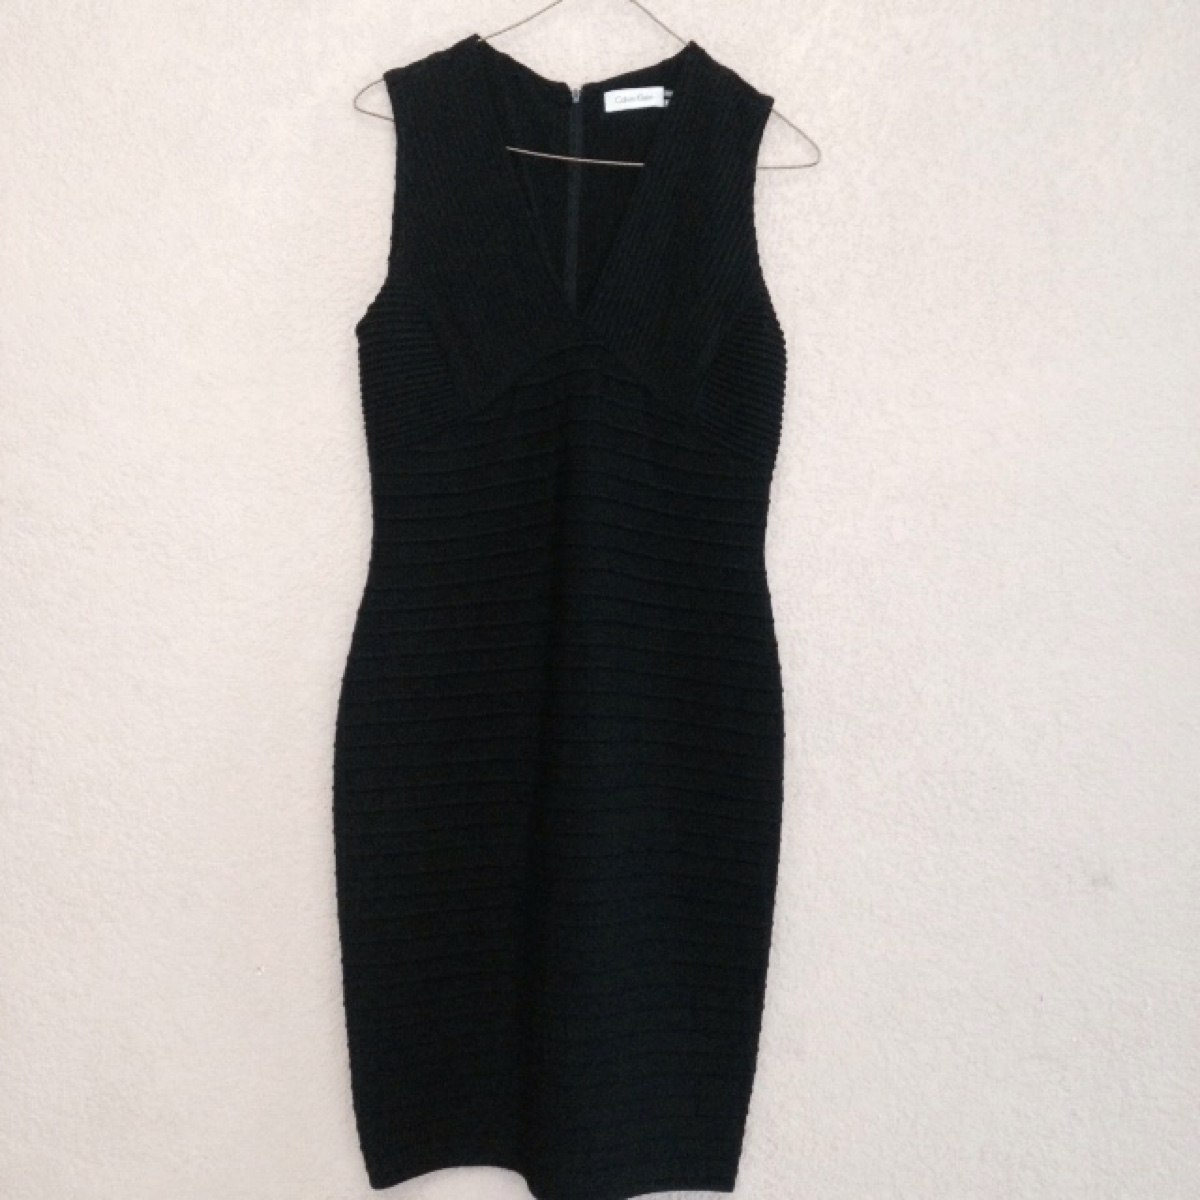 fac621189c hermoso vestido negro calvin klein ck 100% original. Cargando zoom.